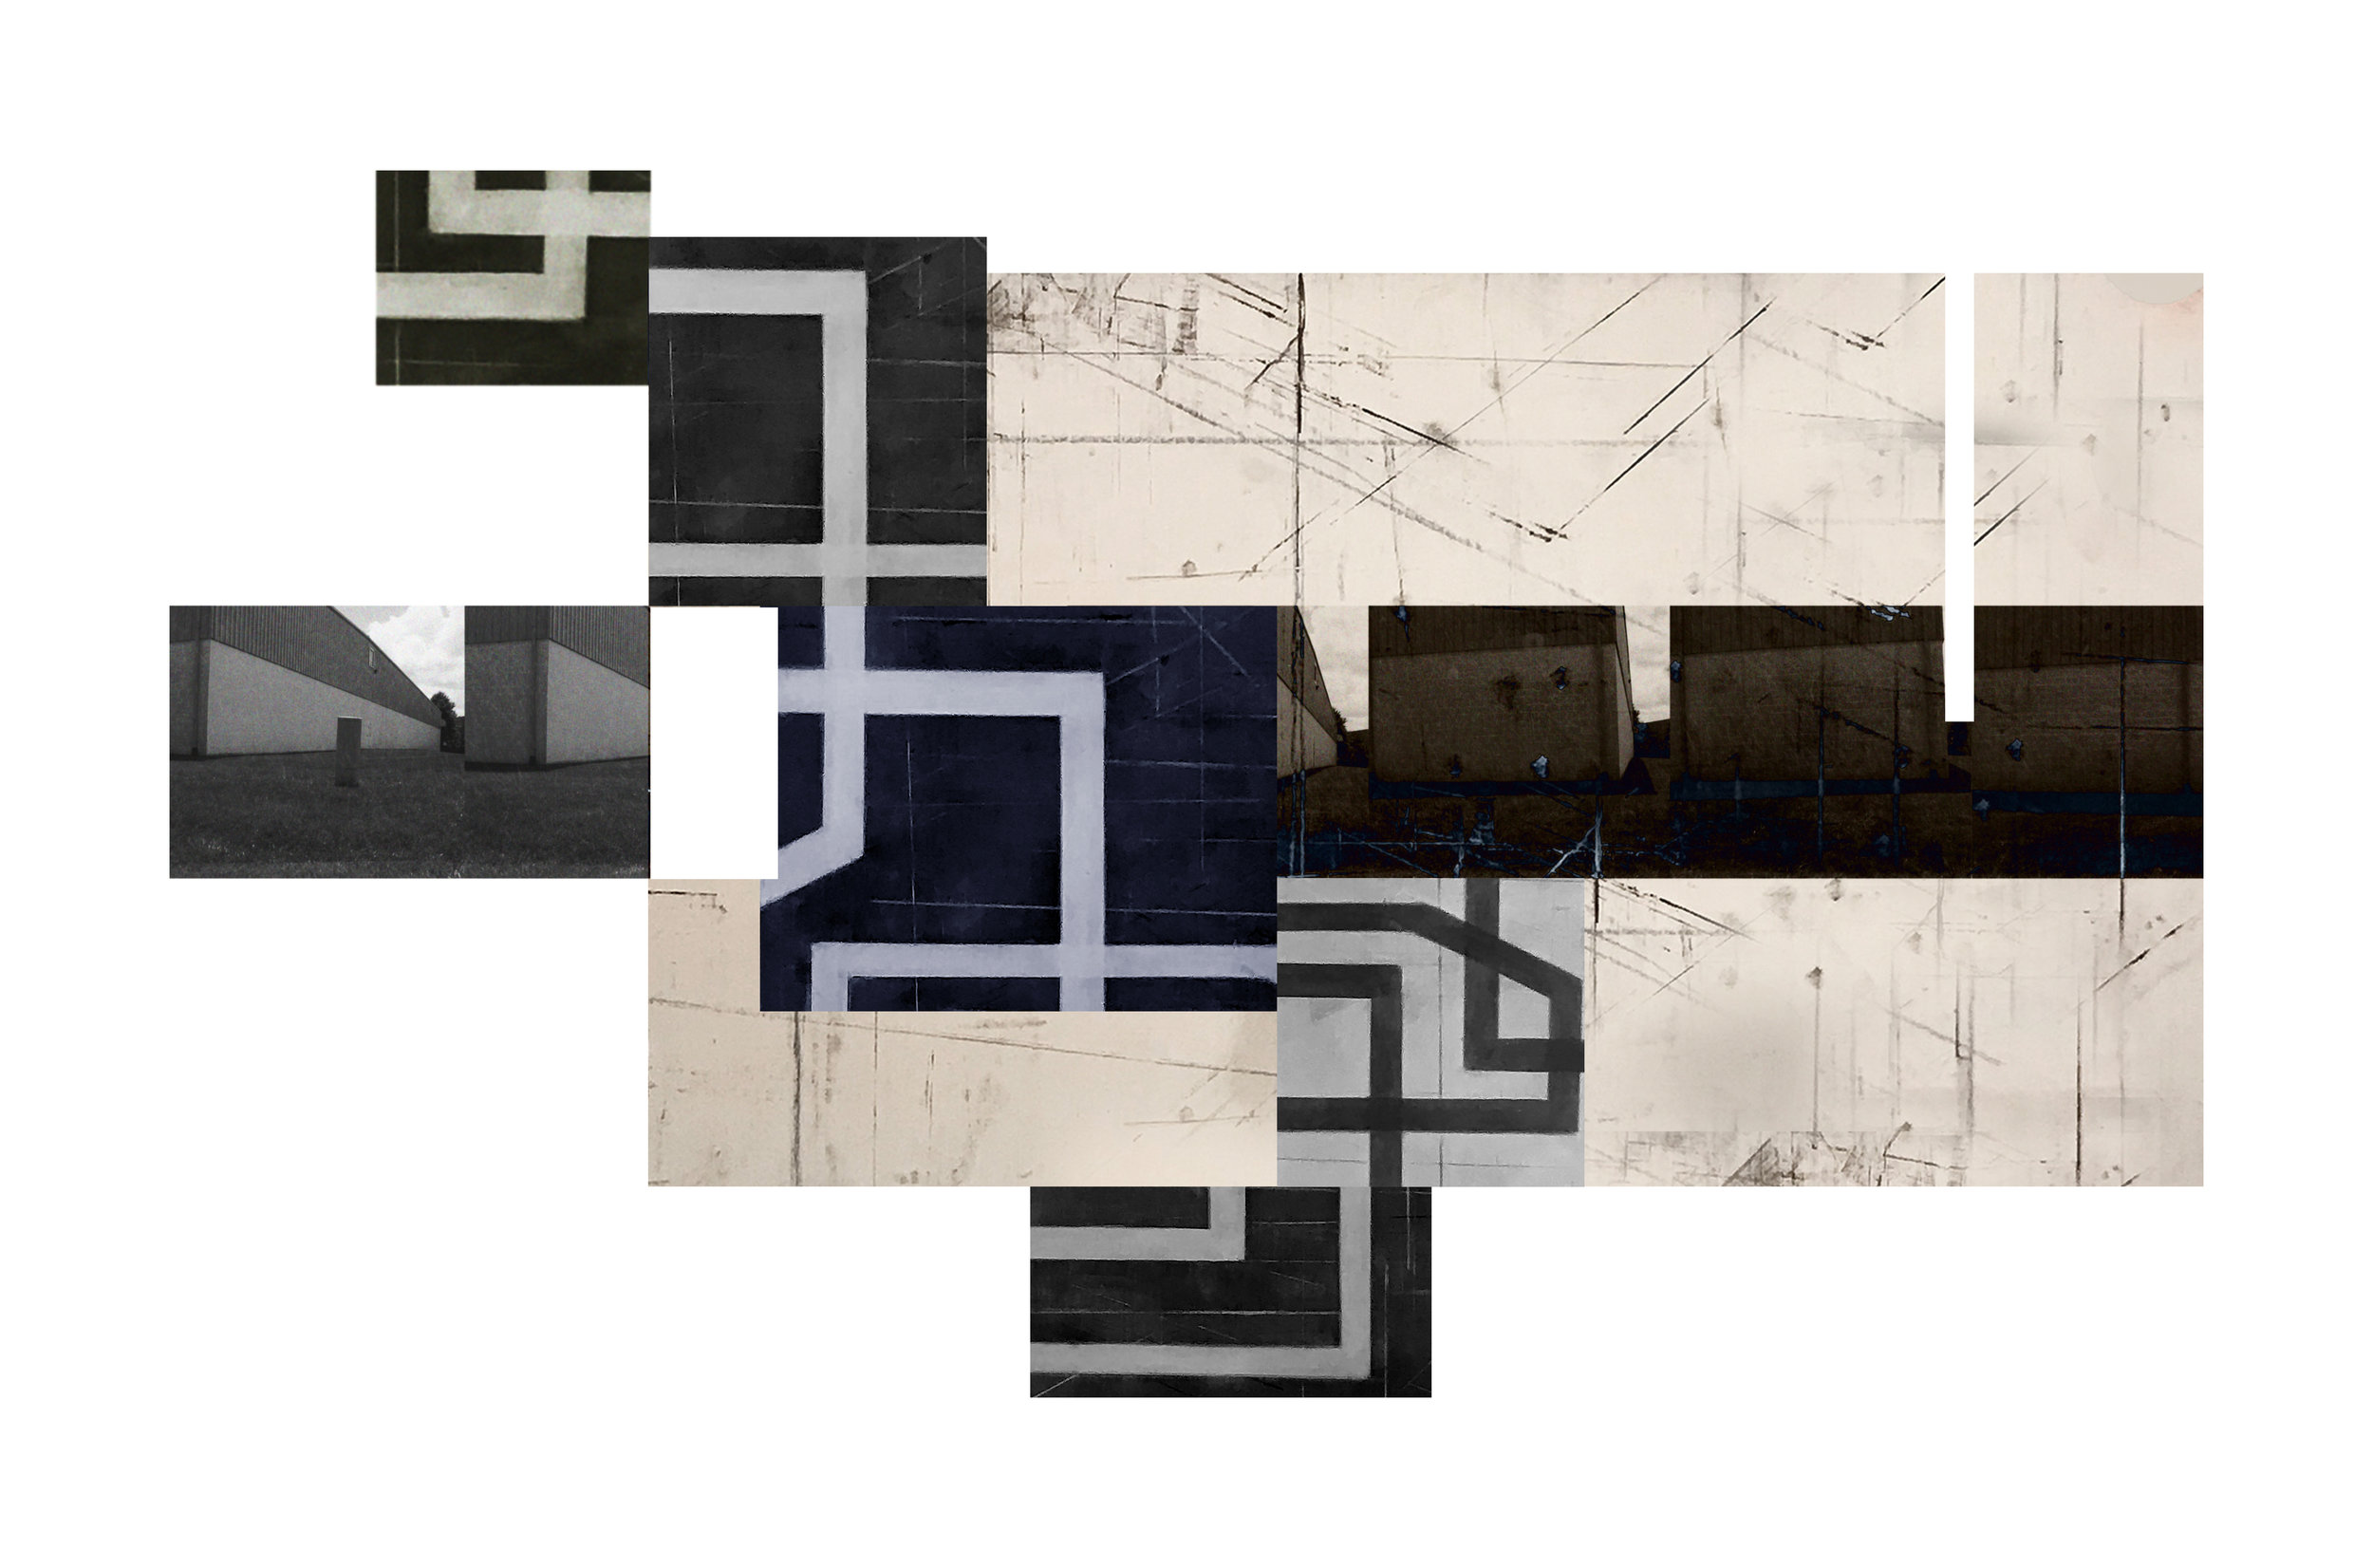 Exurban Archipelago P4 | 2018 | archival pigment print | 14.5 x 24 inches